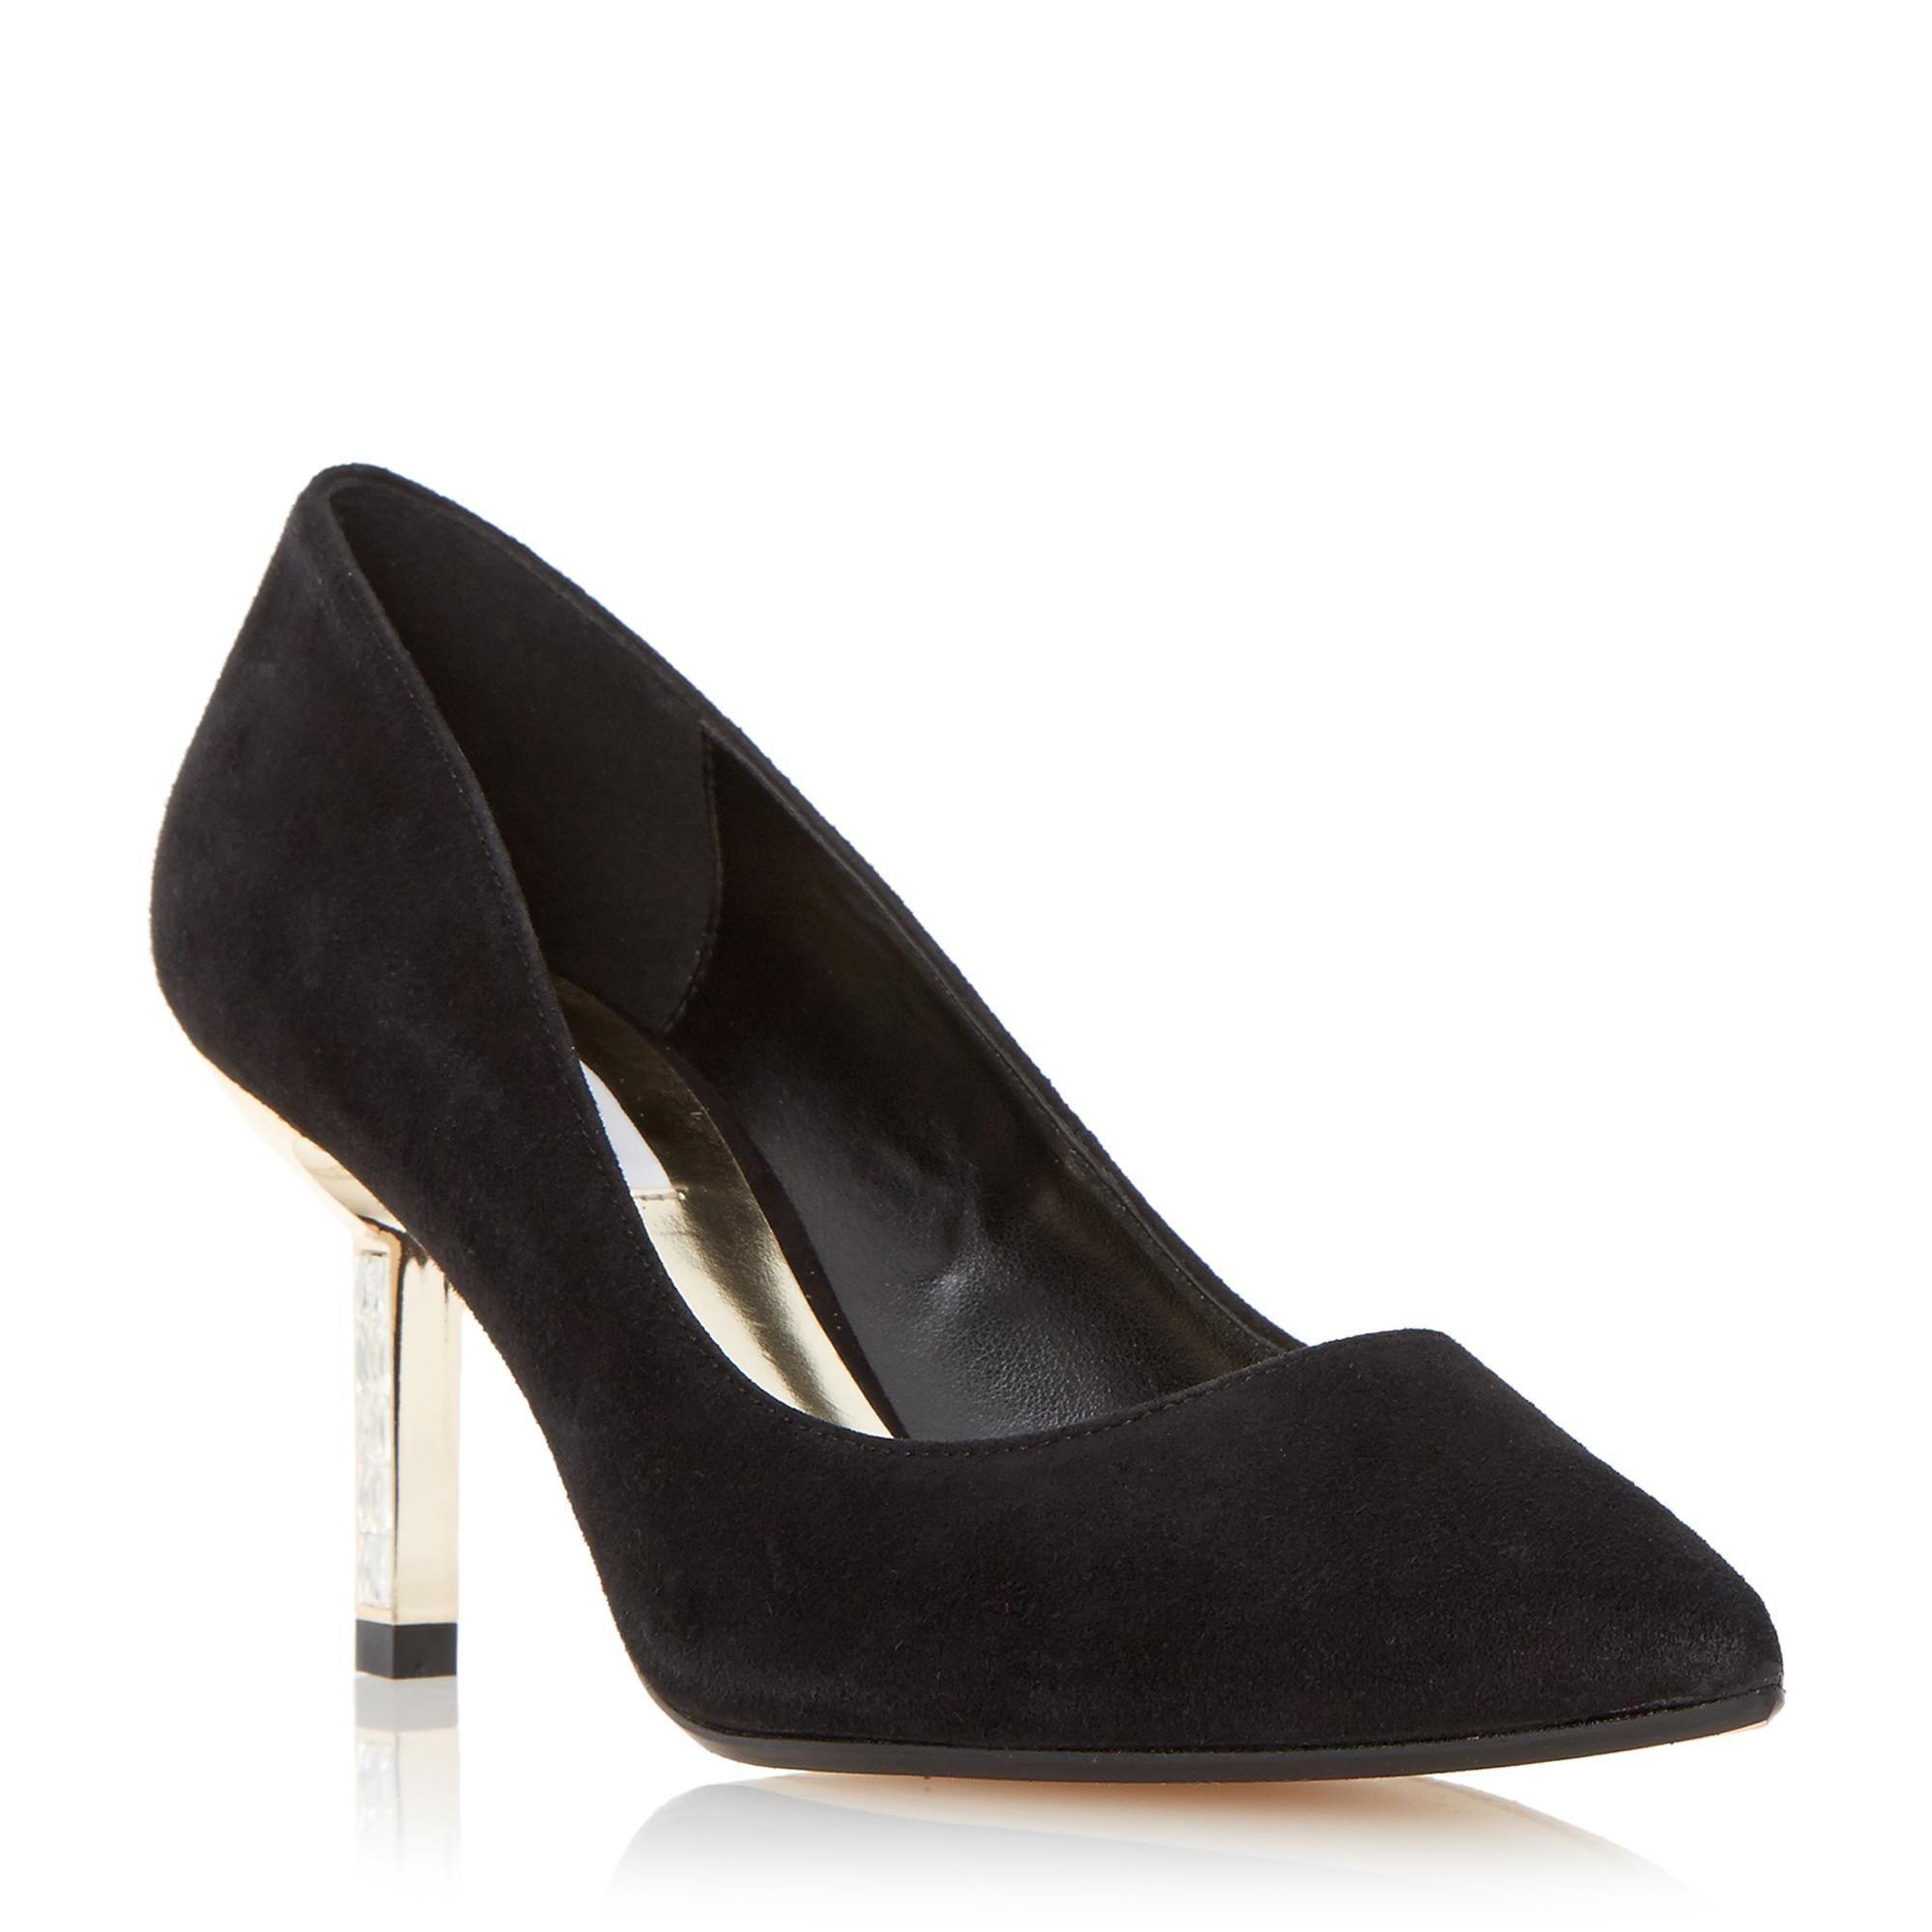 9eacd91fc5ca DUNE LADIES BEATRIXX - Jewel Mid Heel Court Shoe - black